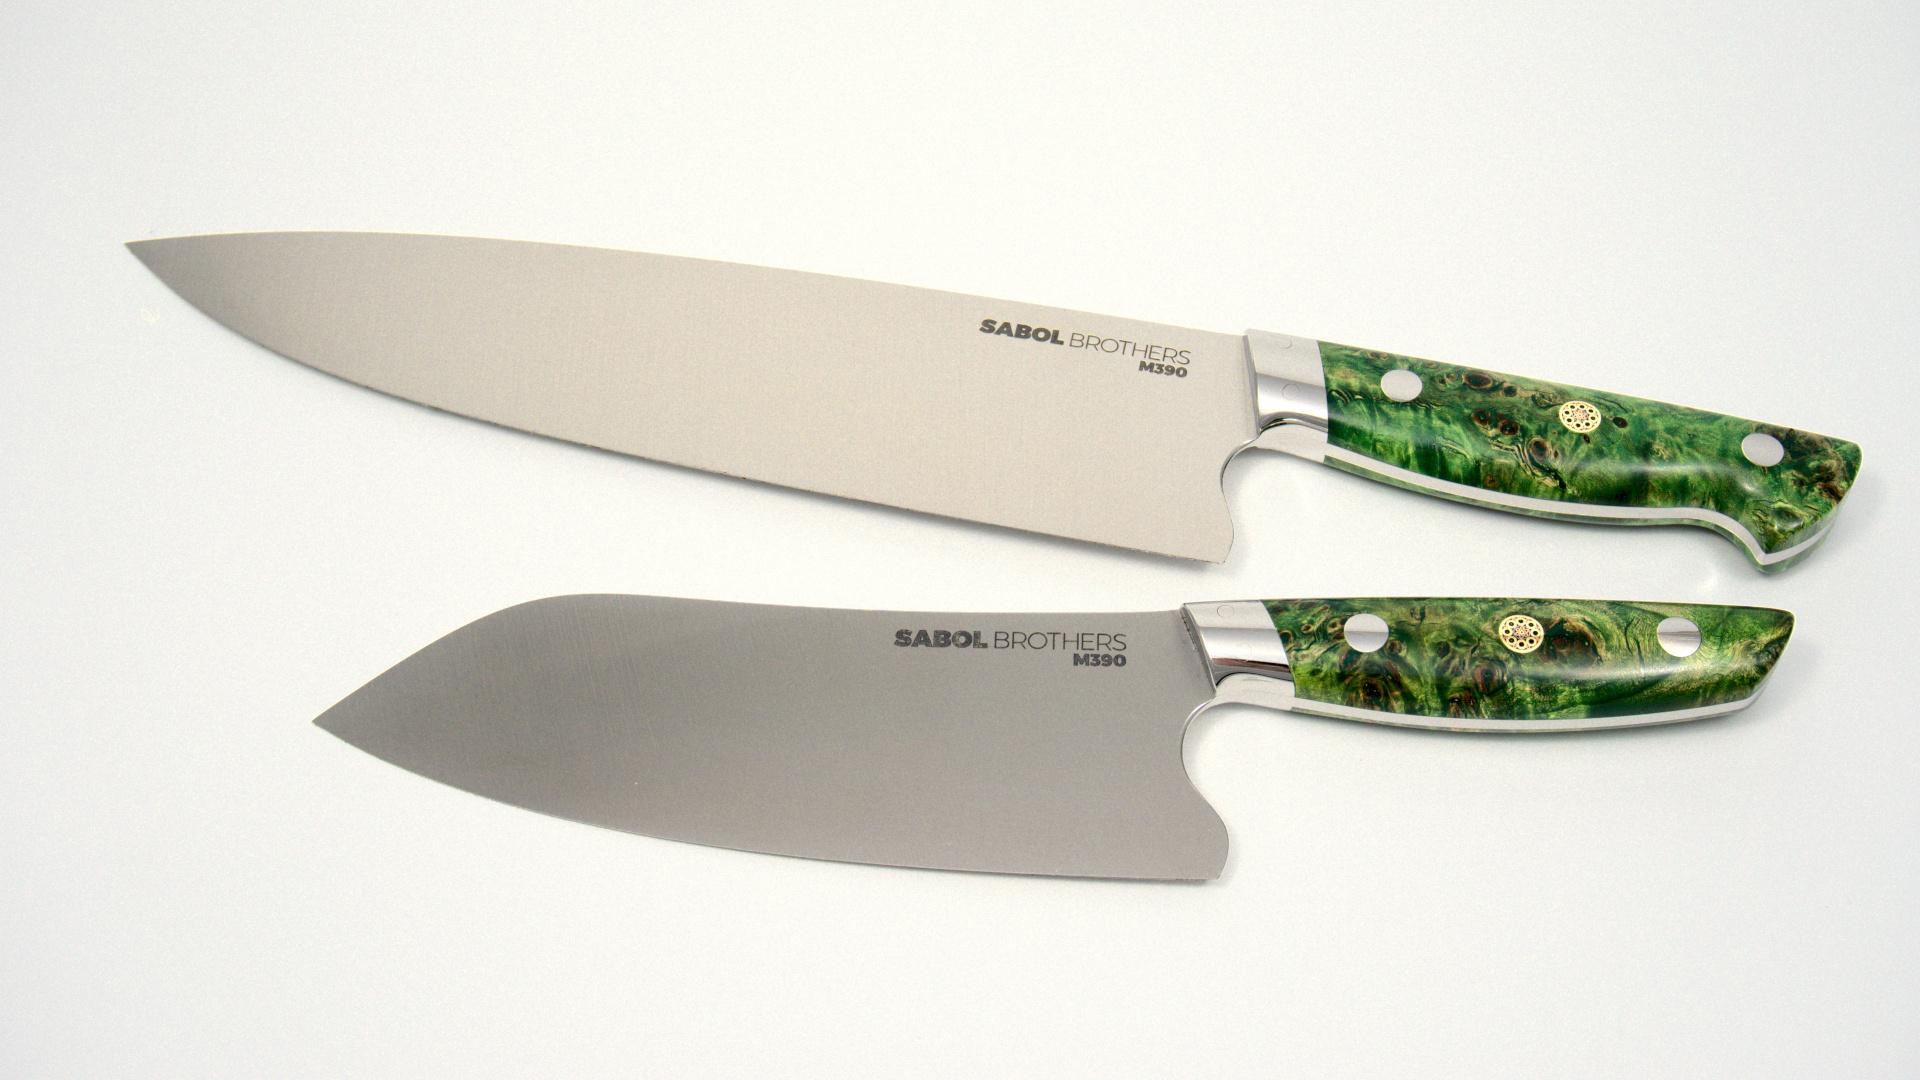 sabolbrothers-m390_set_9_5_inch_160_santoku-raffir_green_poplar-1